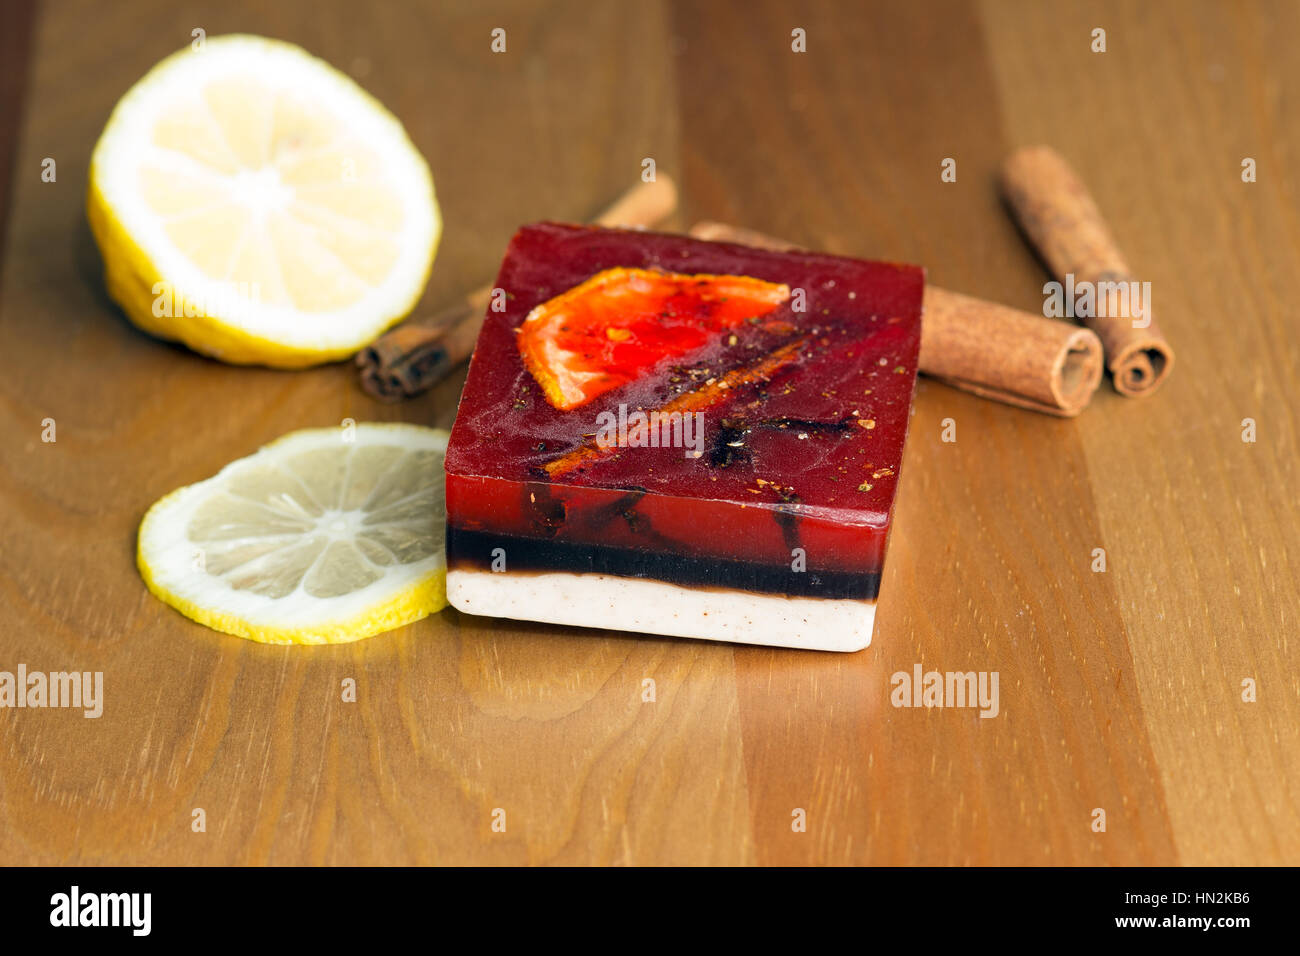 Tri-color jabón artesanal forma rectangular con limón y karitsey Imagen De Stock